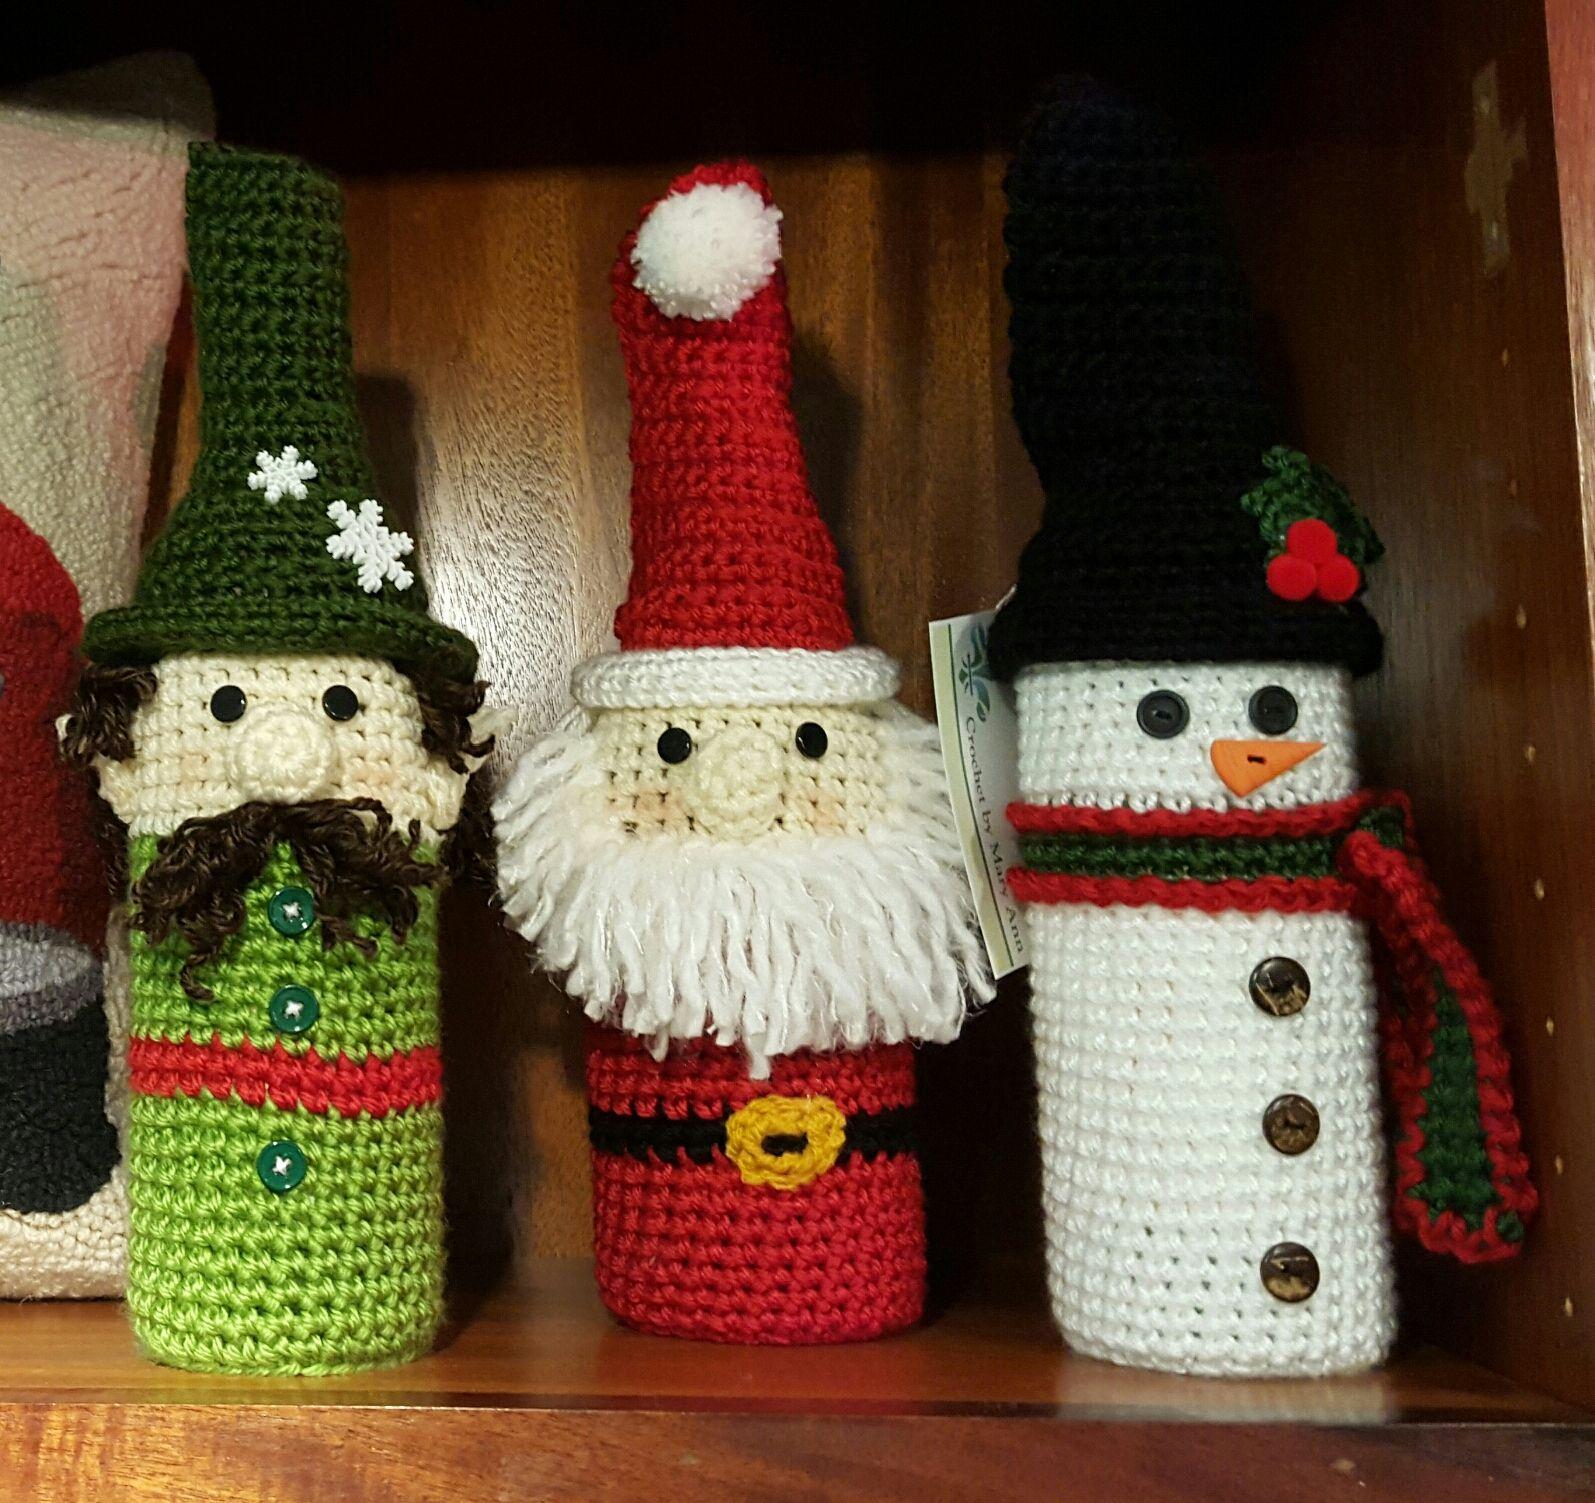 Fantastically Festive Bottle Buddies created by Mary Ann :)